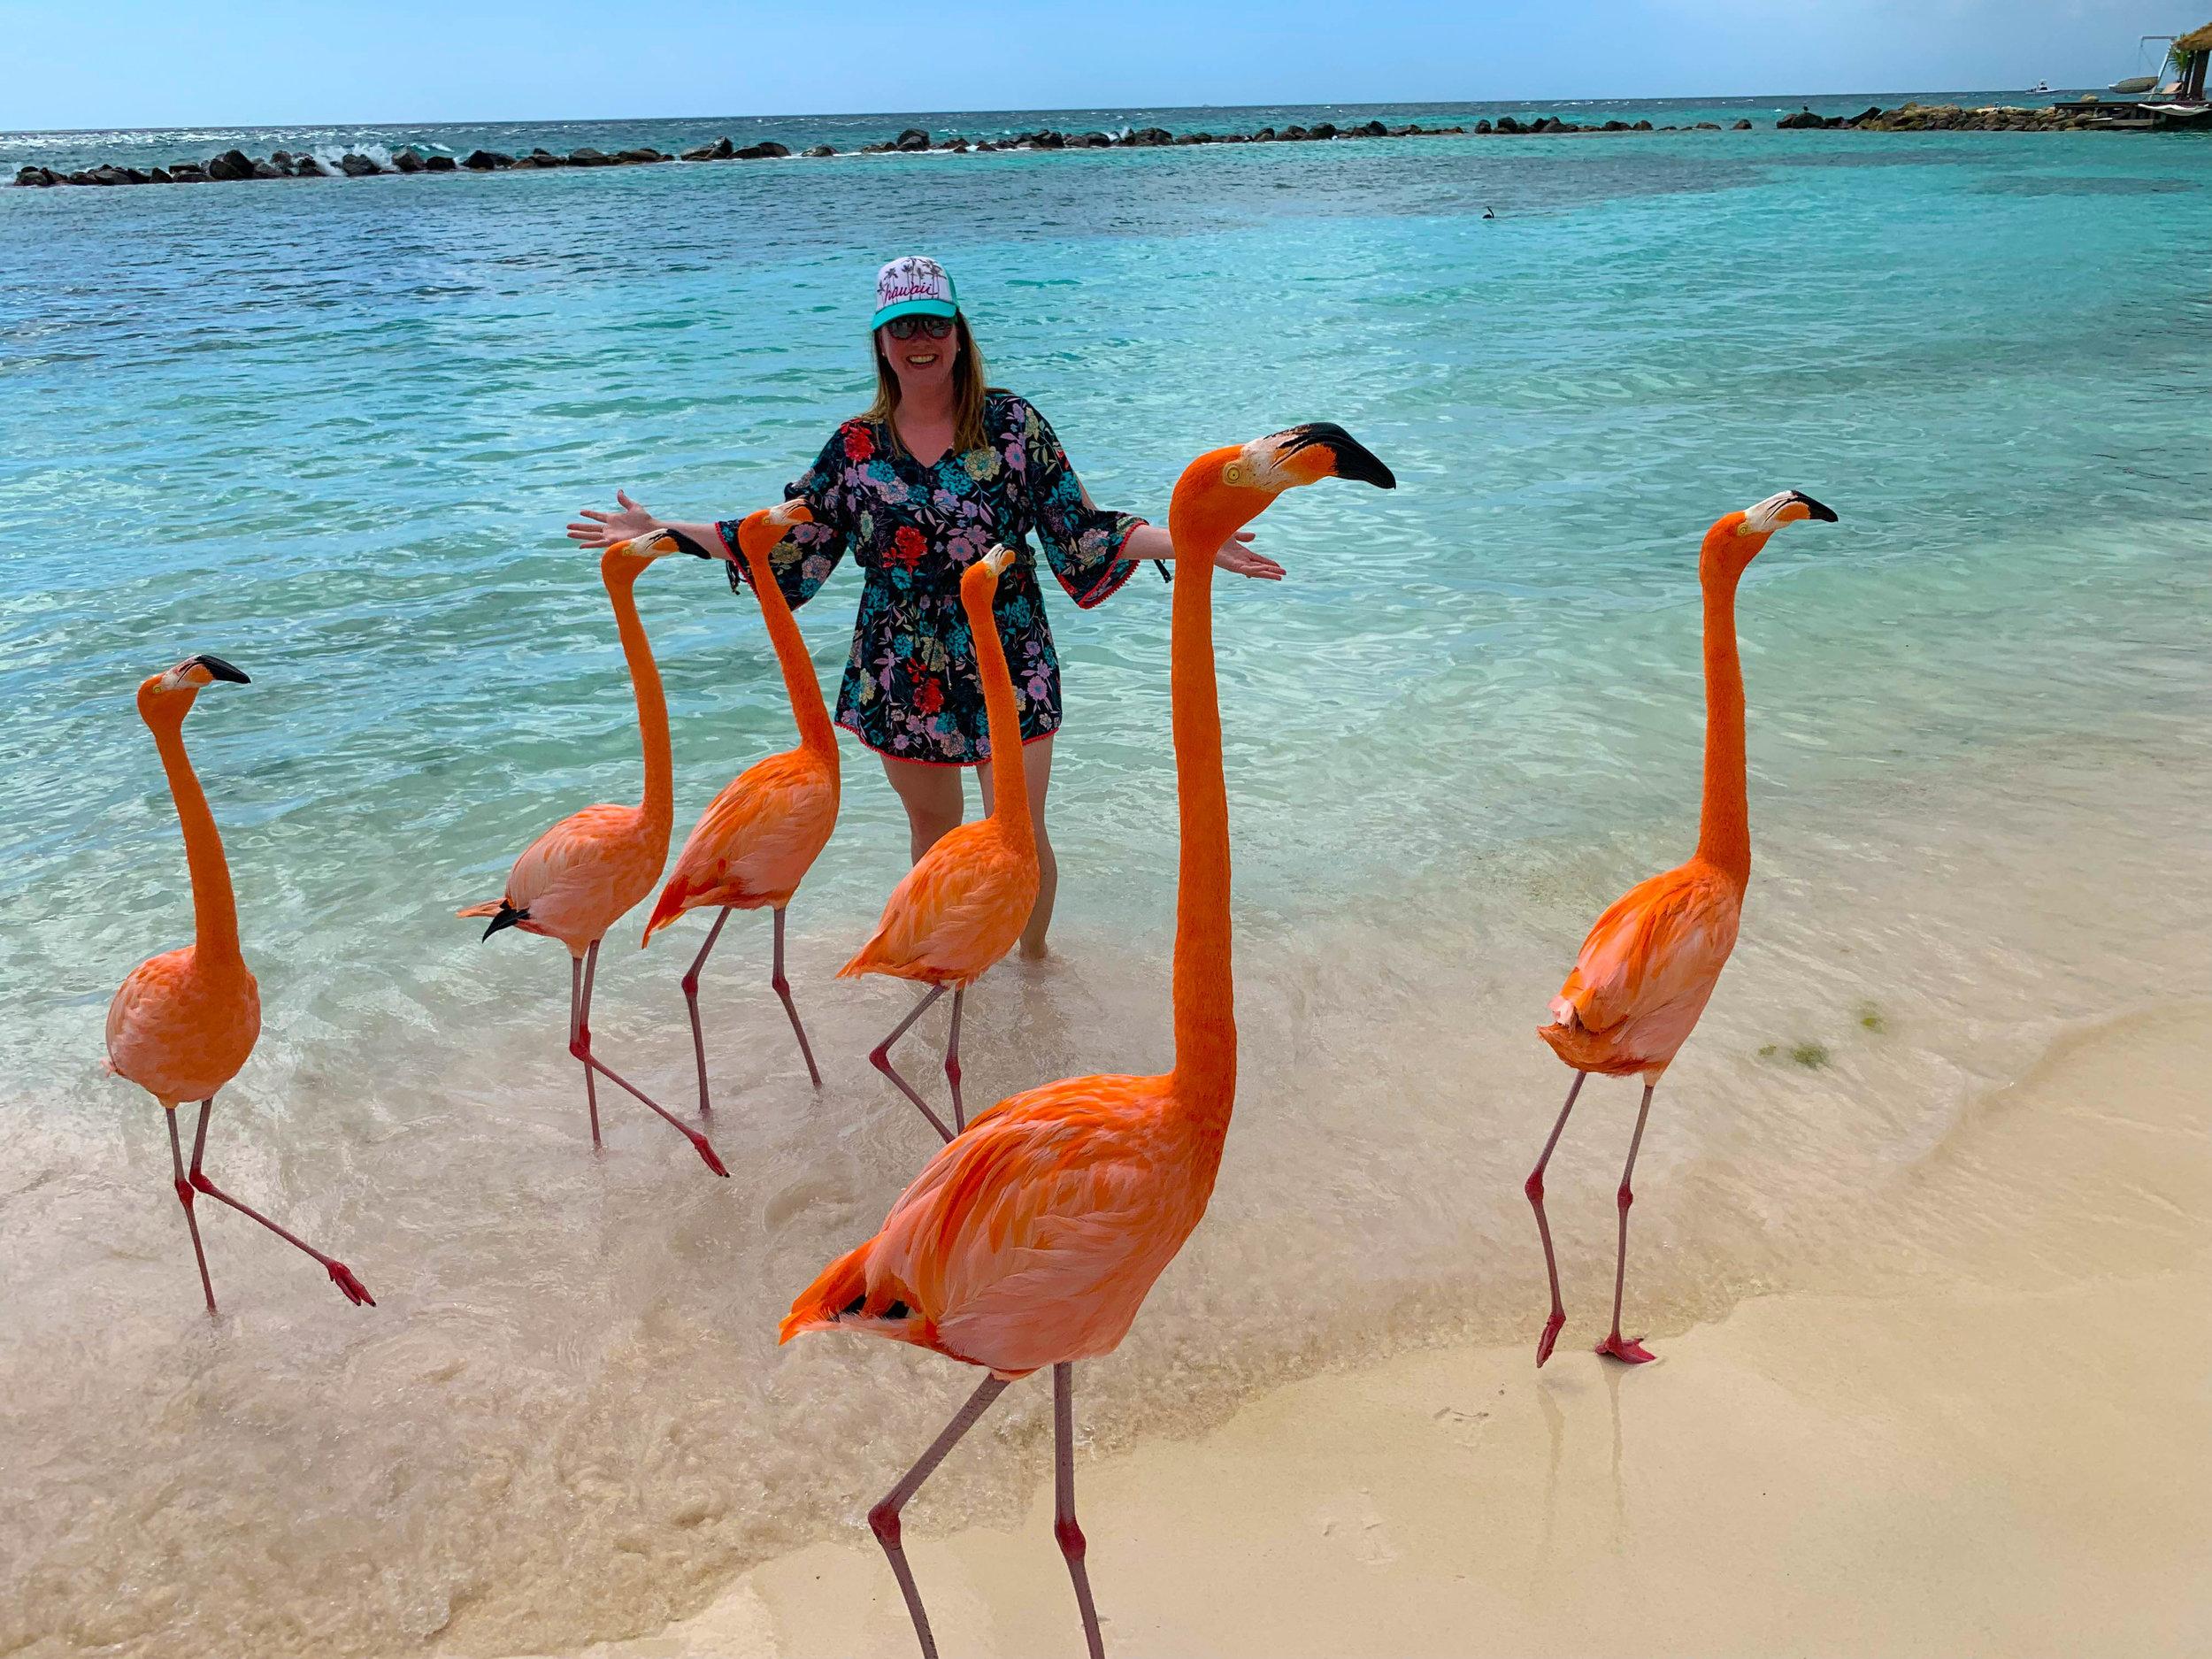 Aruba-Flamingo-Island-19.jpg